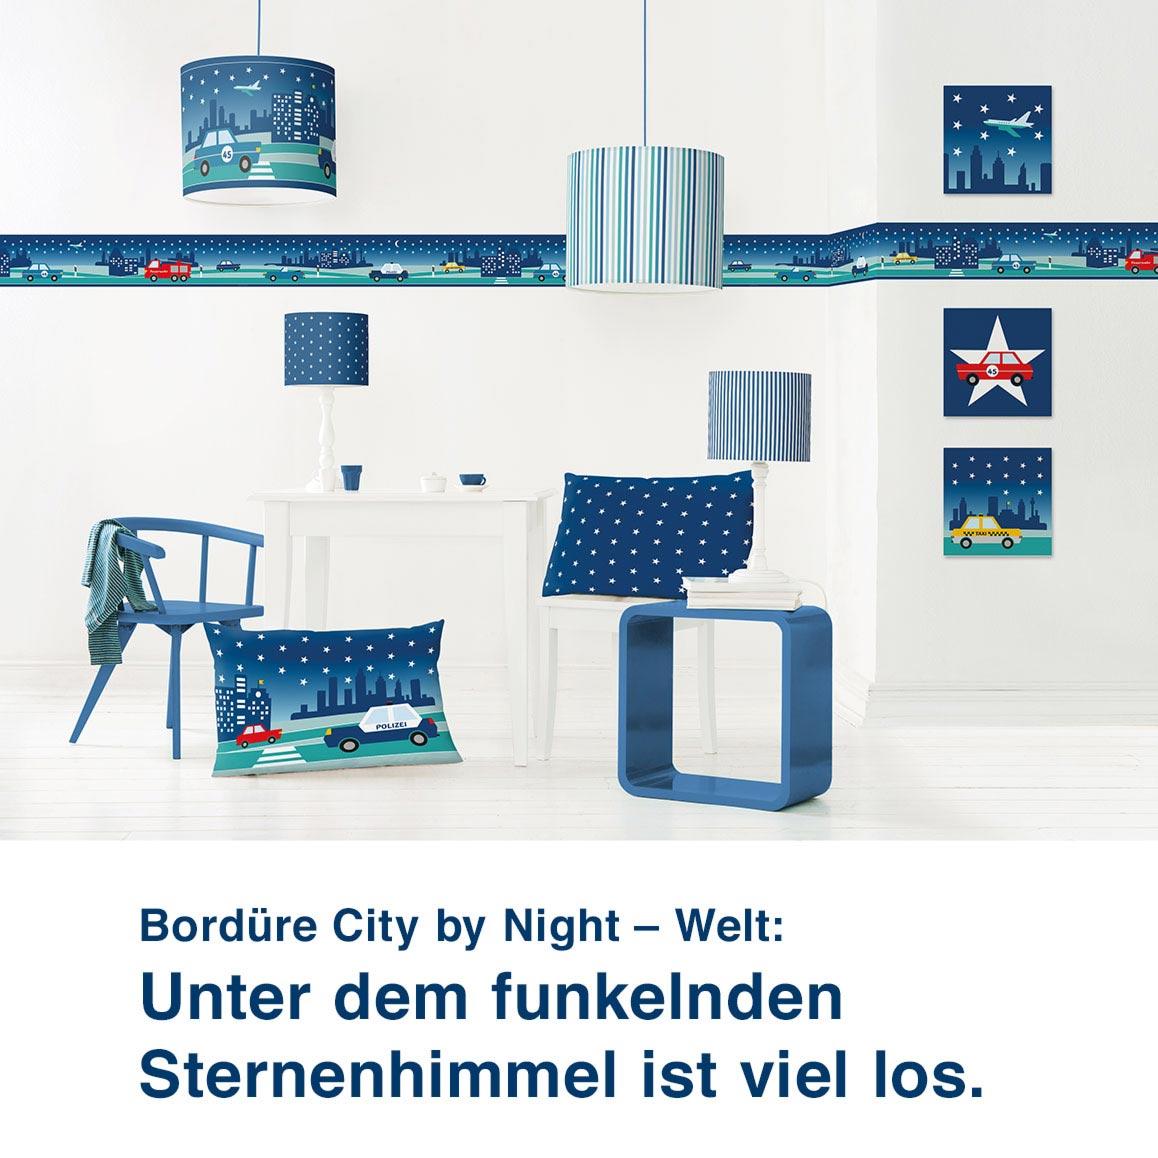 Bordüre City by Night – Welt:  Unter dem funkelnden  Sternenhimmel ist viel los.